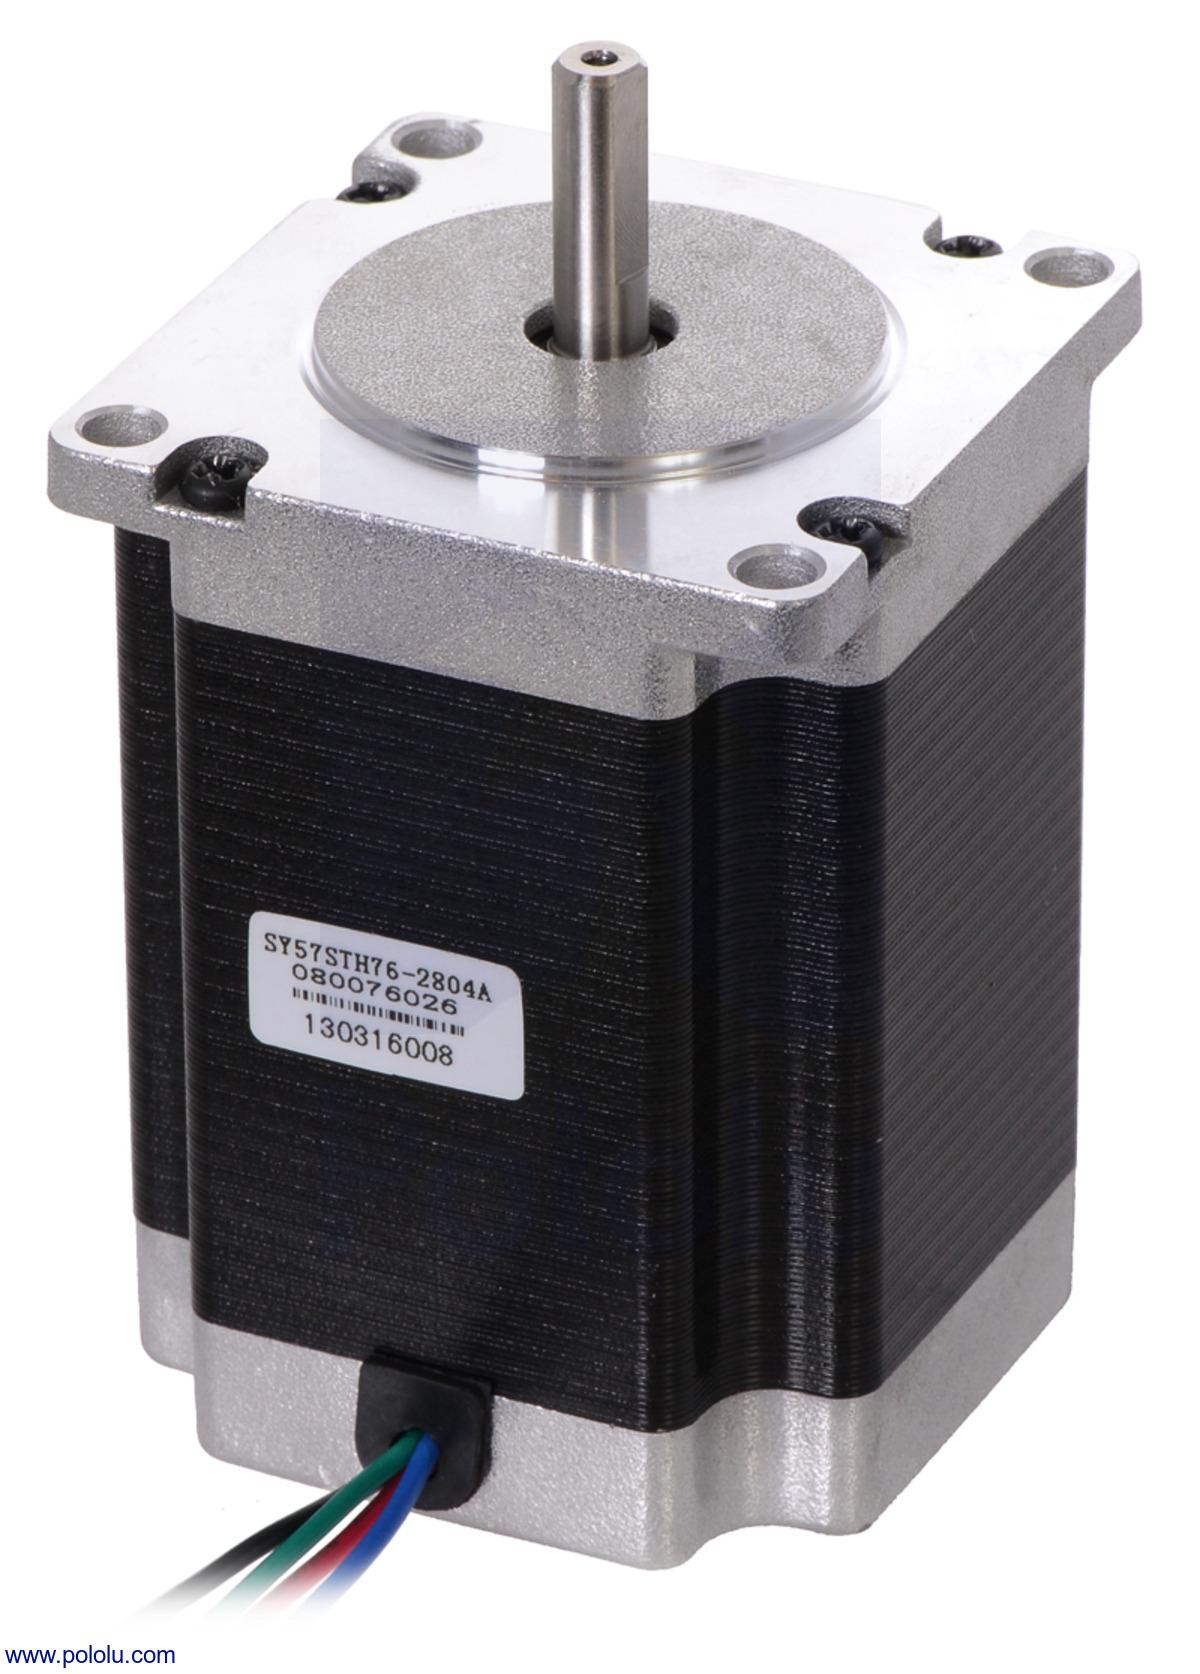 stepper motor bipolar 200 steps rev 57 76mm 3 2v 2 8 a phase [ 1200 x 1674 Pixel ]